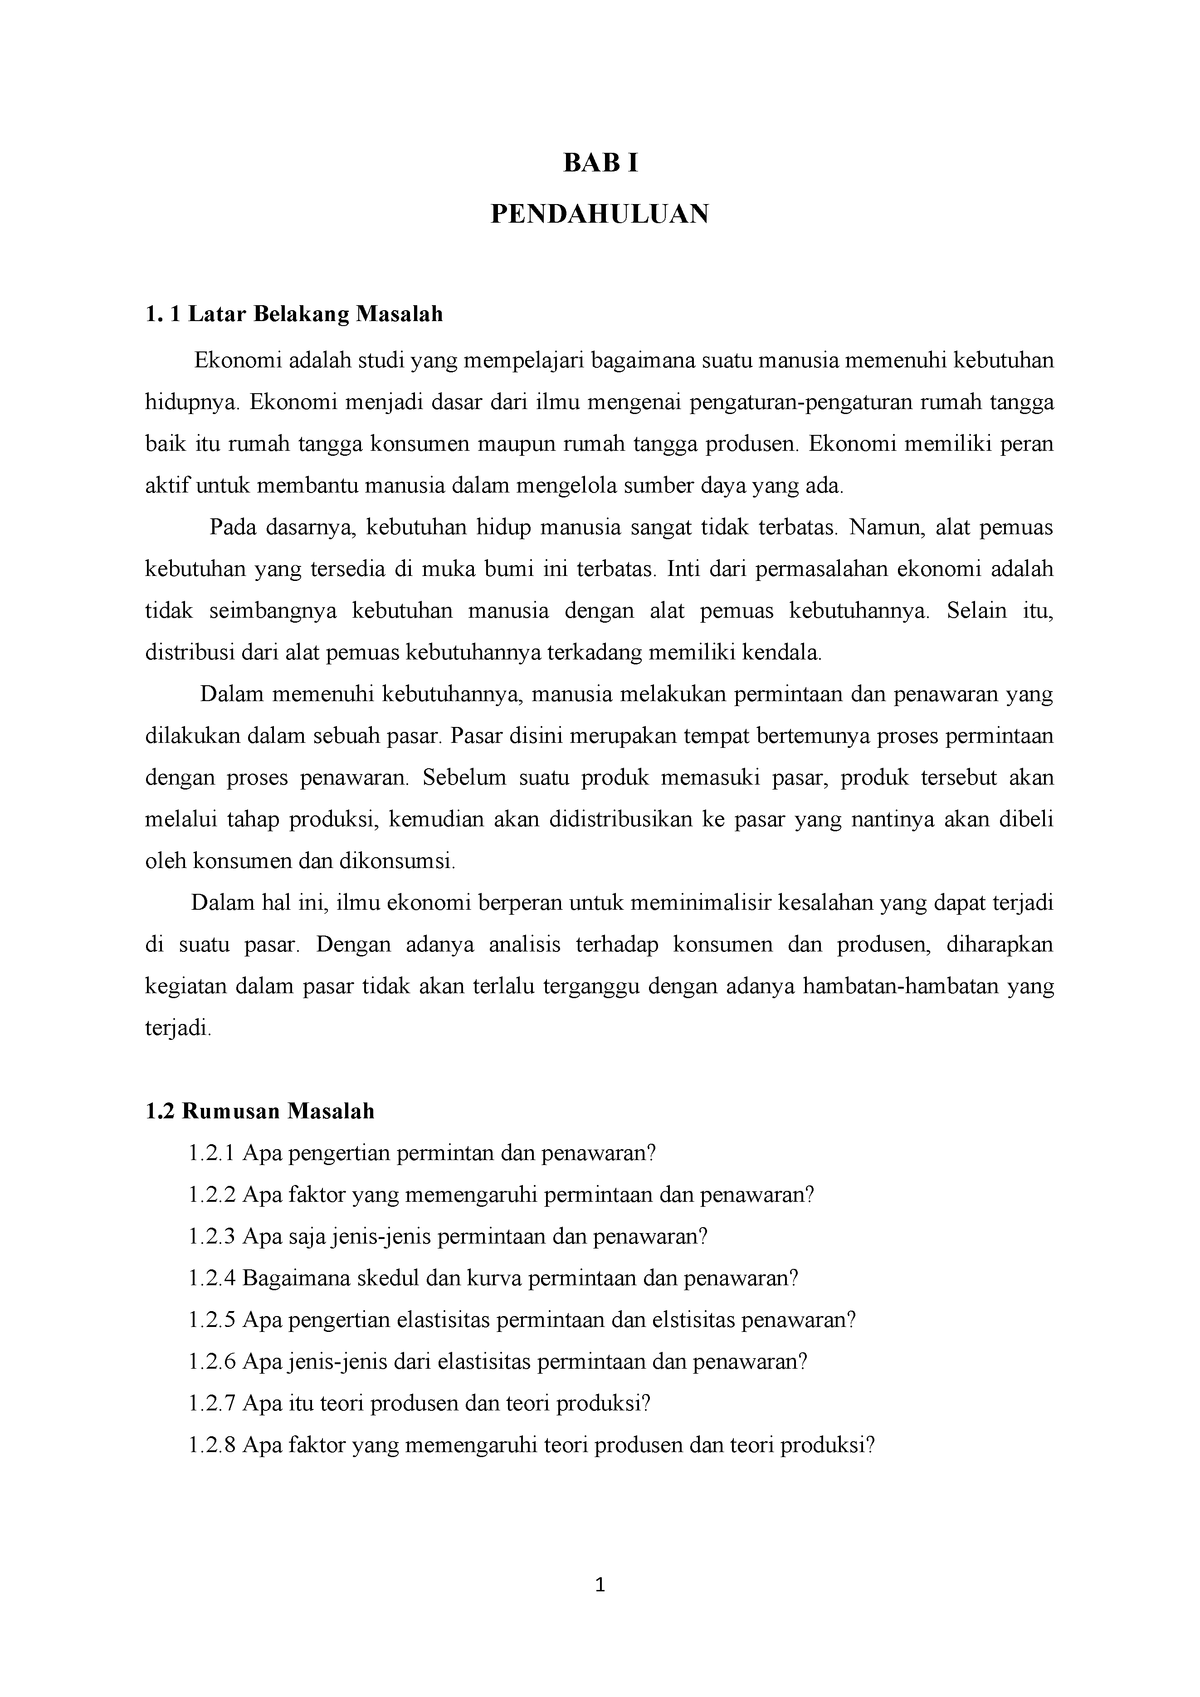 Makalah Pengantar Ilmu Ekonomi Studocu